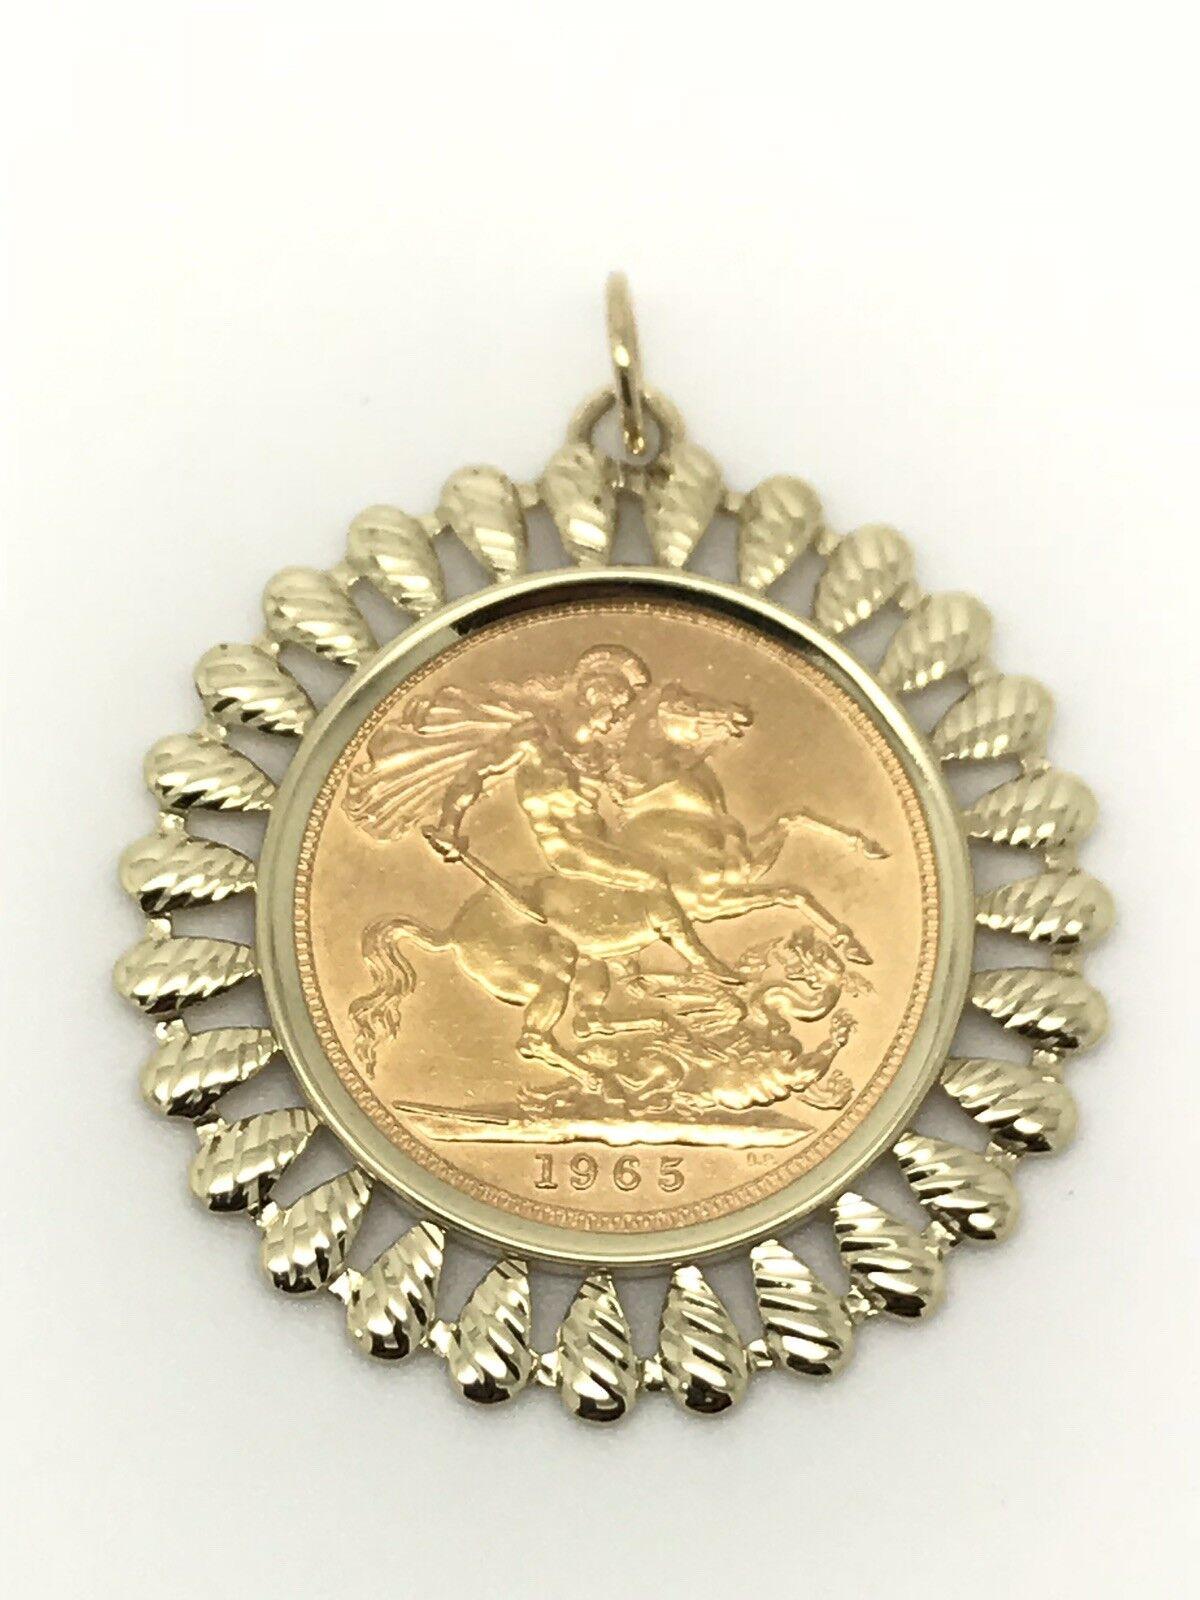 1965 Full Sovereign Pendant - Elizabeth II - 22ct gold - Frill Mount - 10.45g